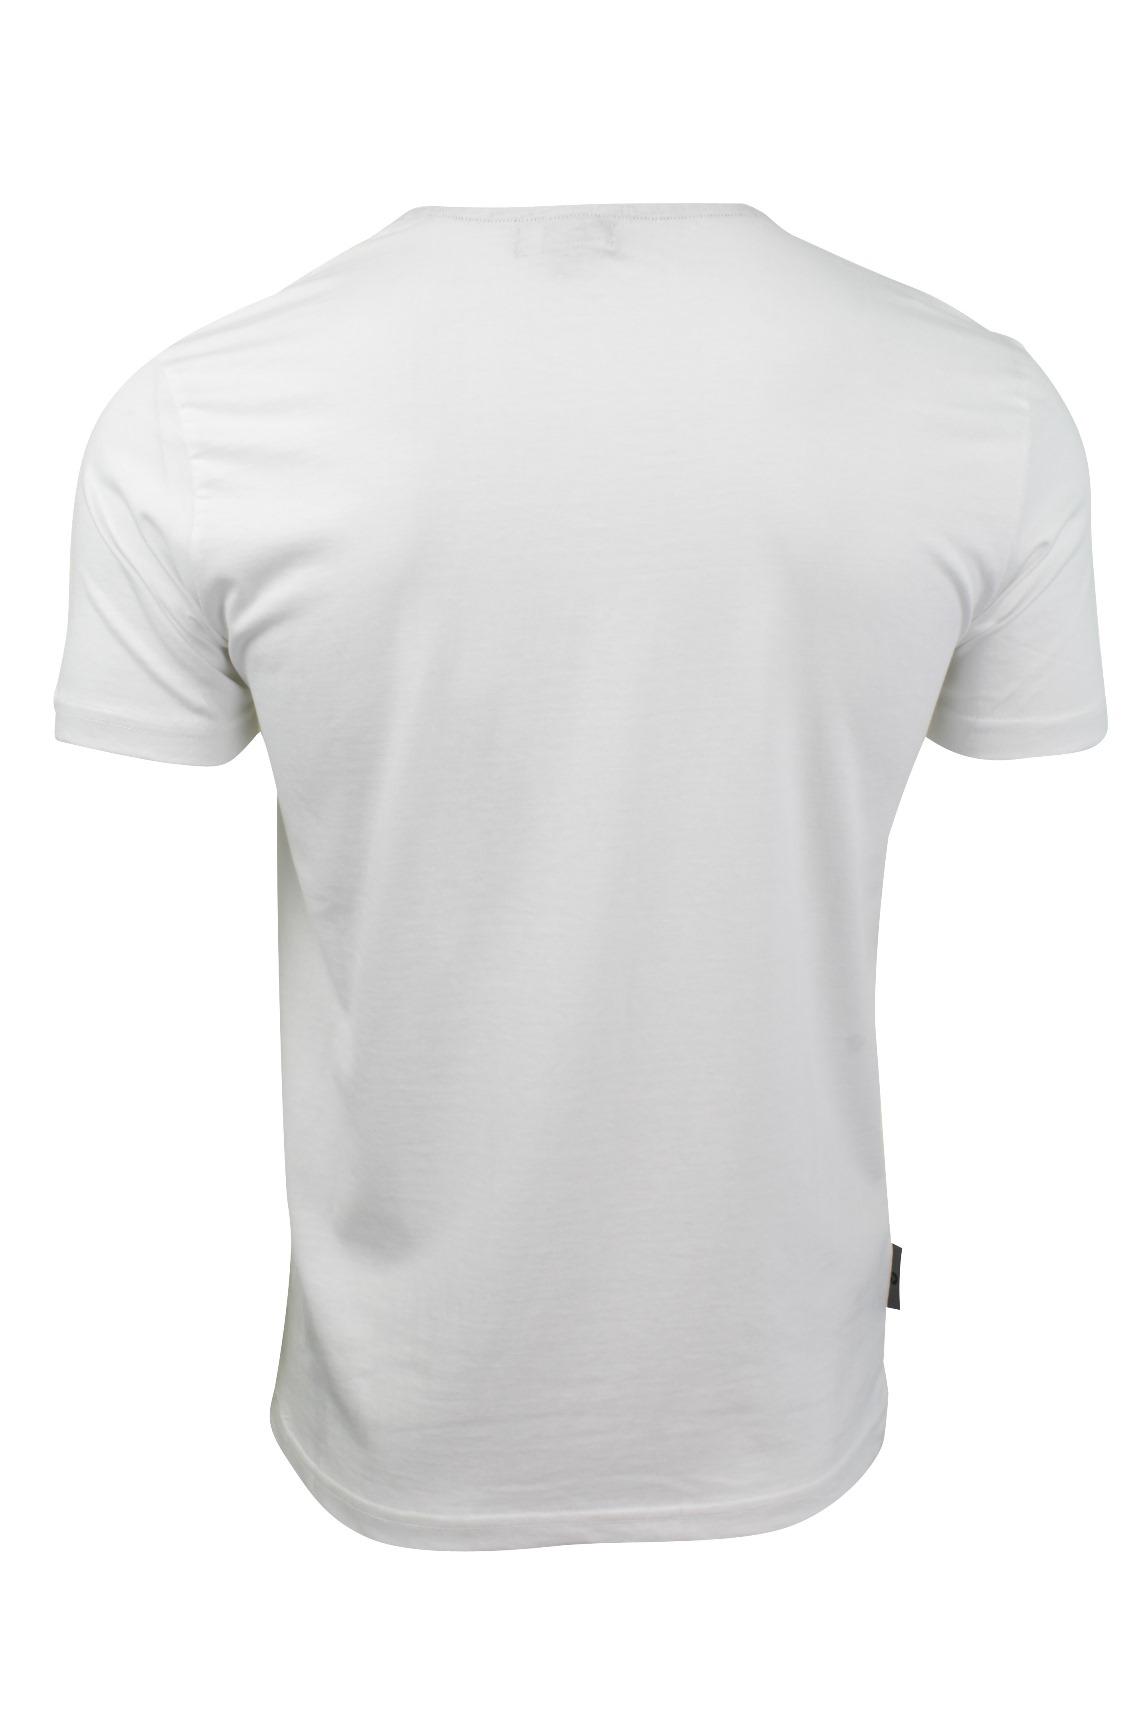 Hombre-Camiseta-De-Voi-Jeans-Manga-Corta miniatura 8